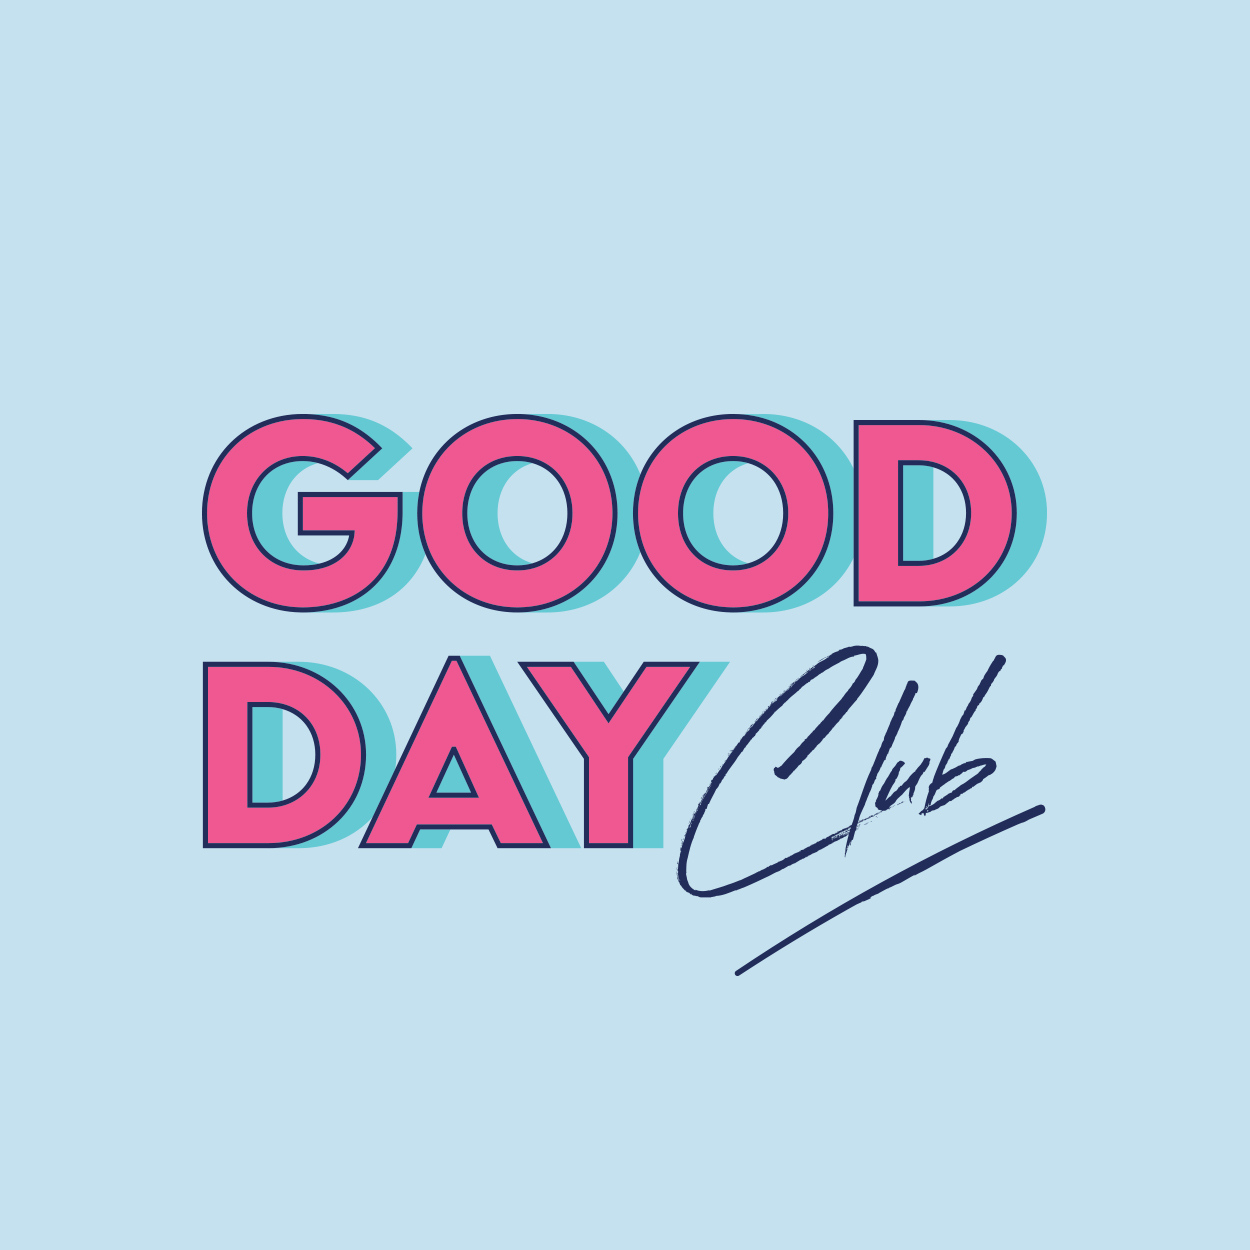 Good Day Club new logo